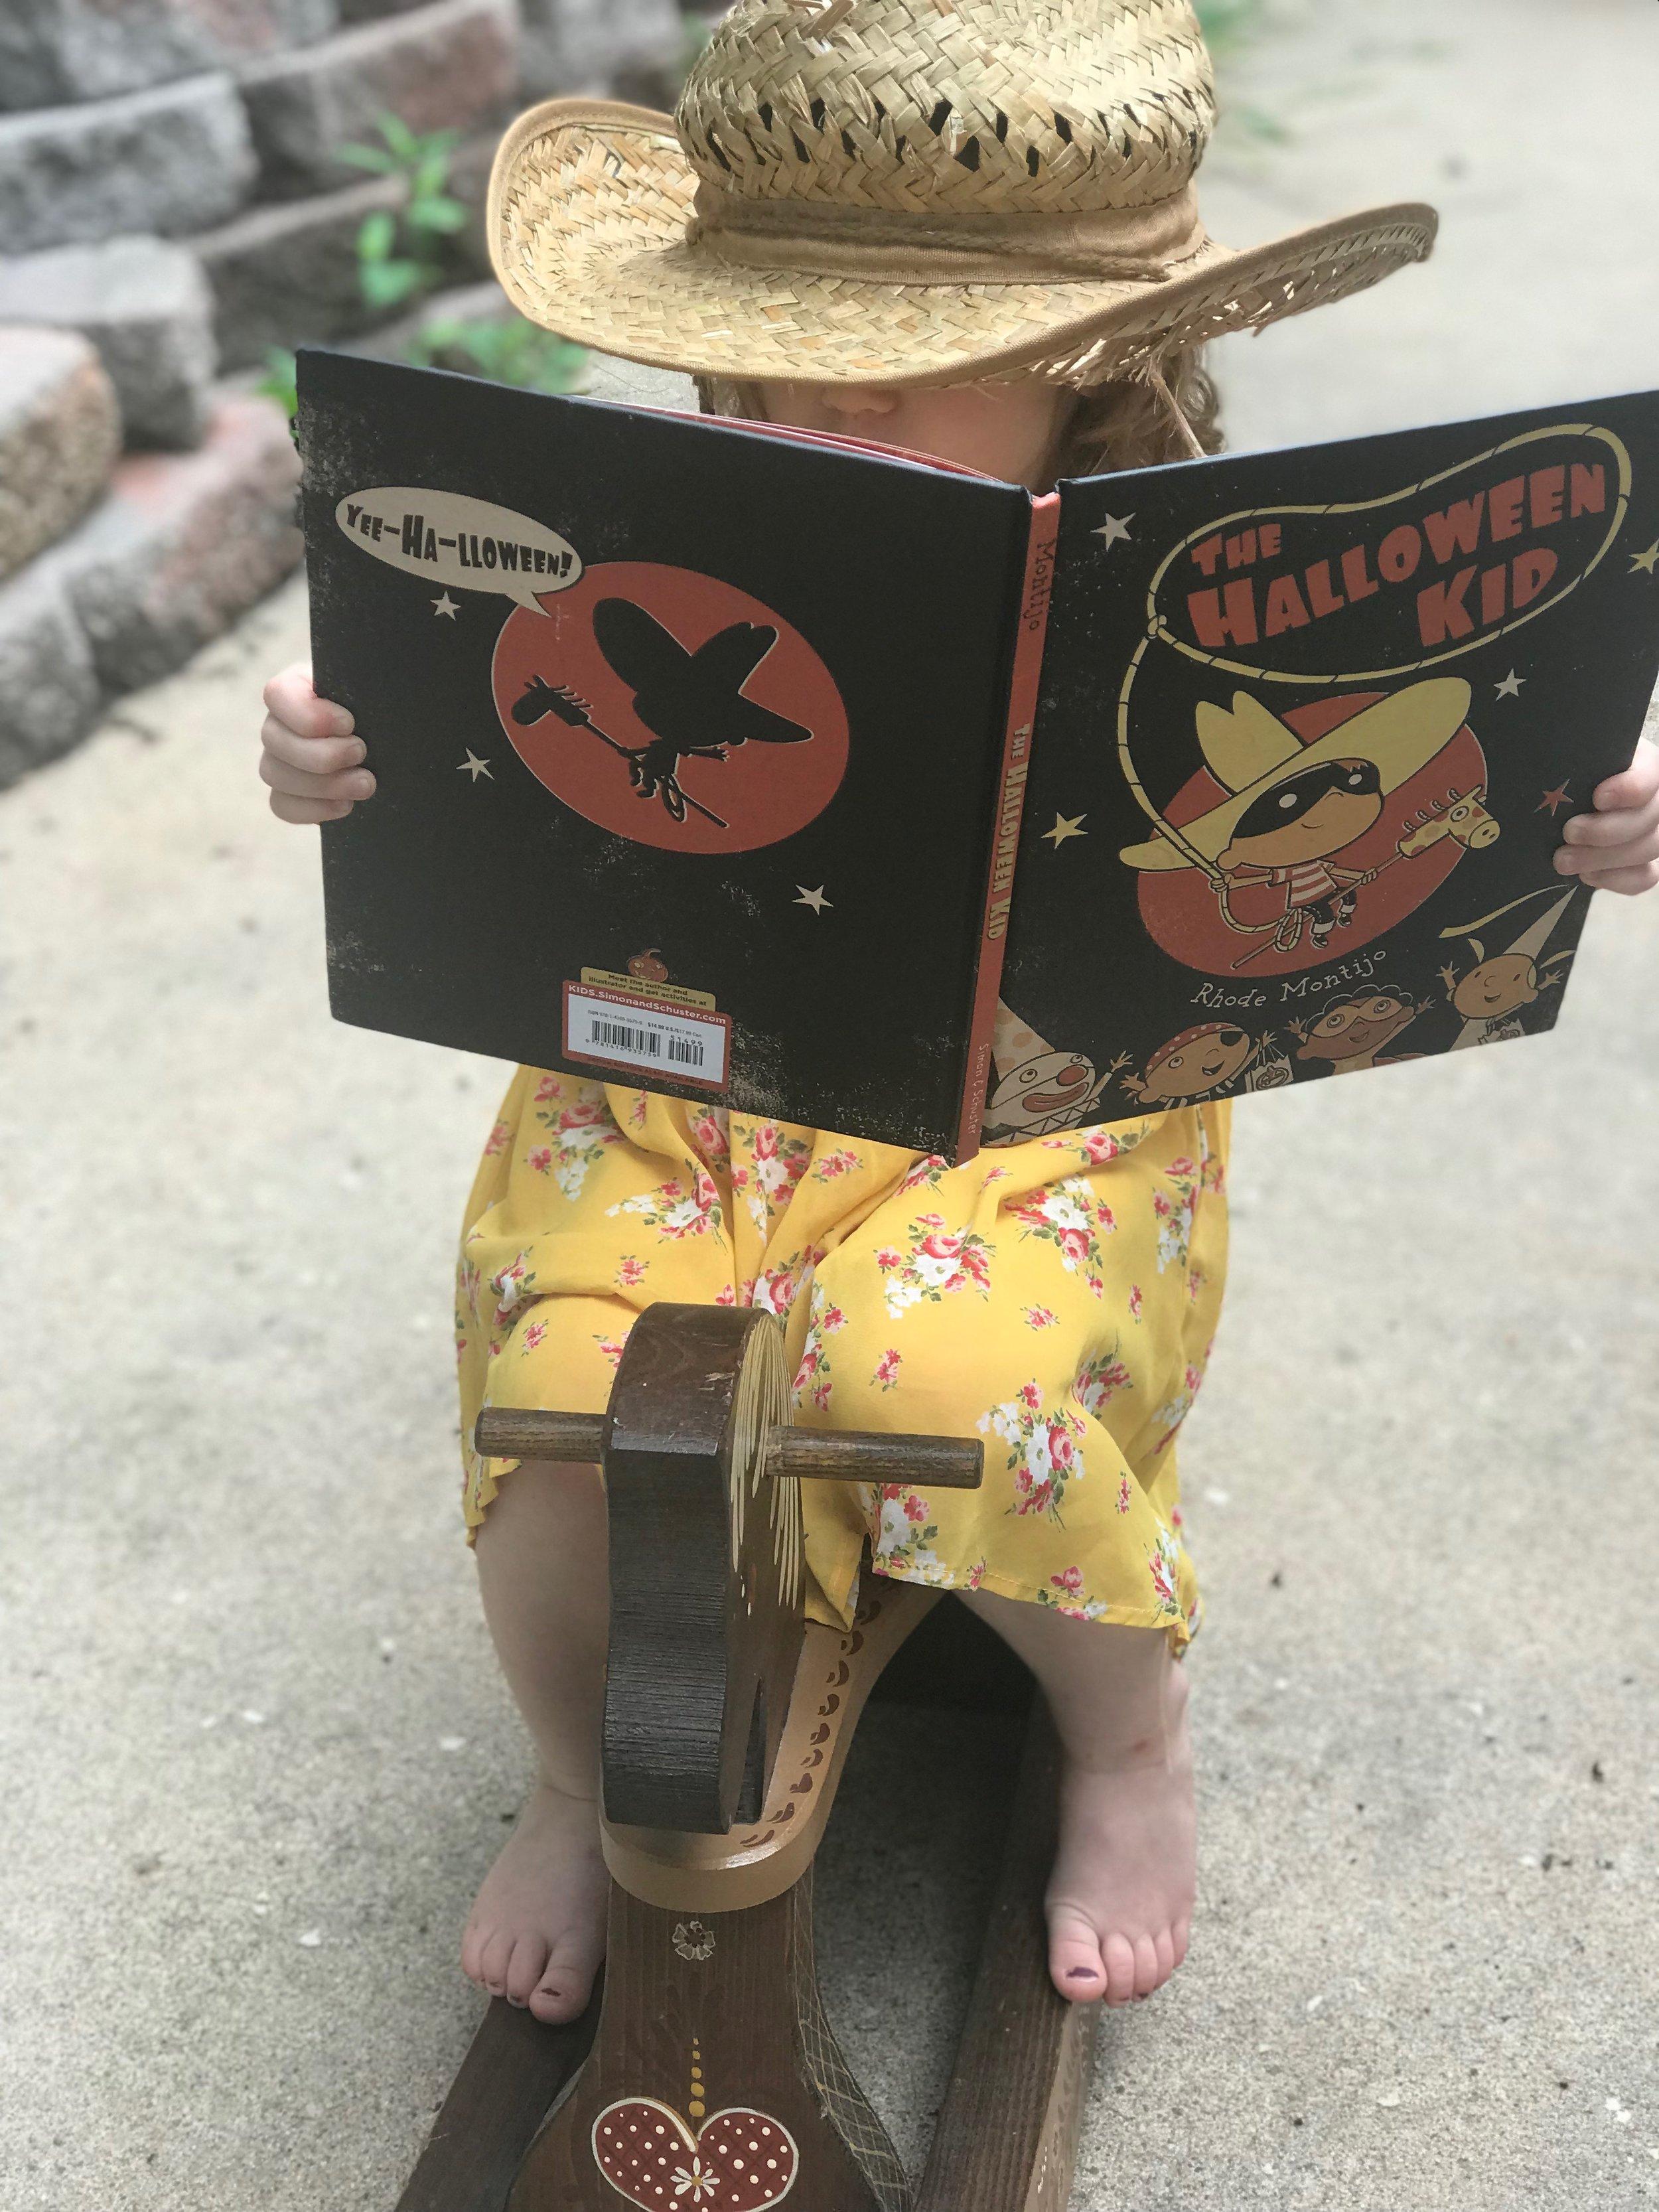 the halloween kid book review 7.jpeg